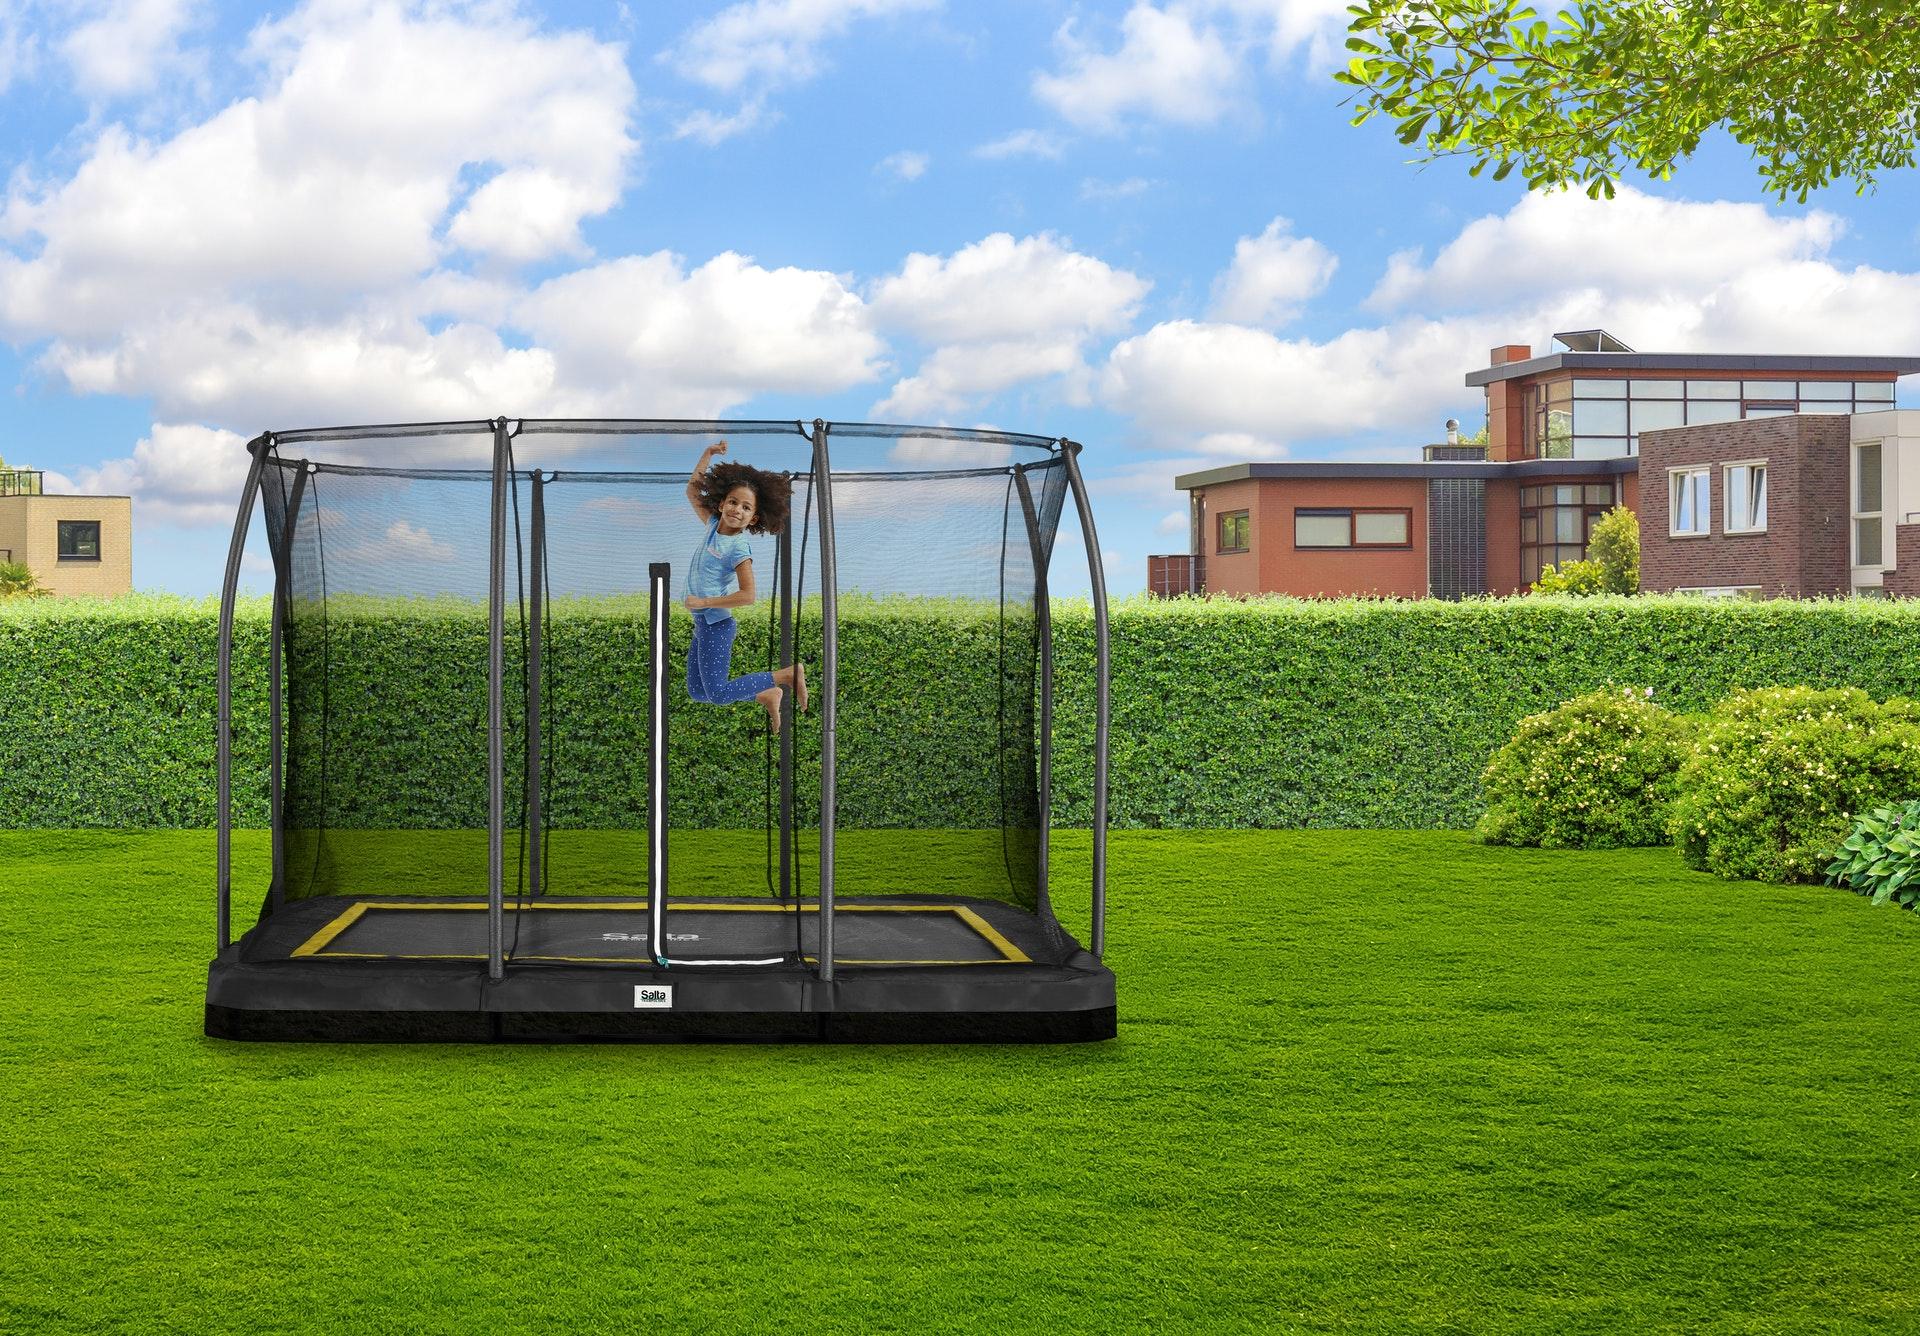 SALTA-TRAMPOLIN__Inground-mit-Netz__SALTA-Comfort - trampolin-profi.de